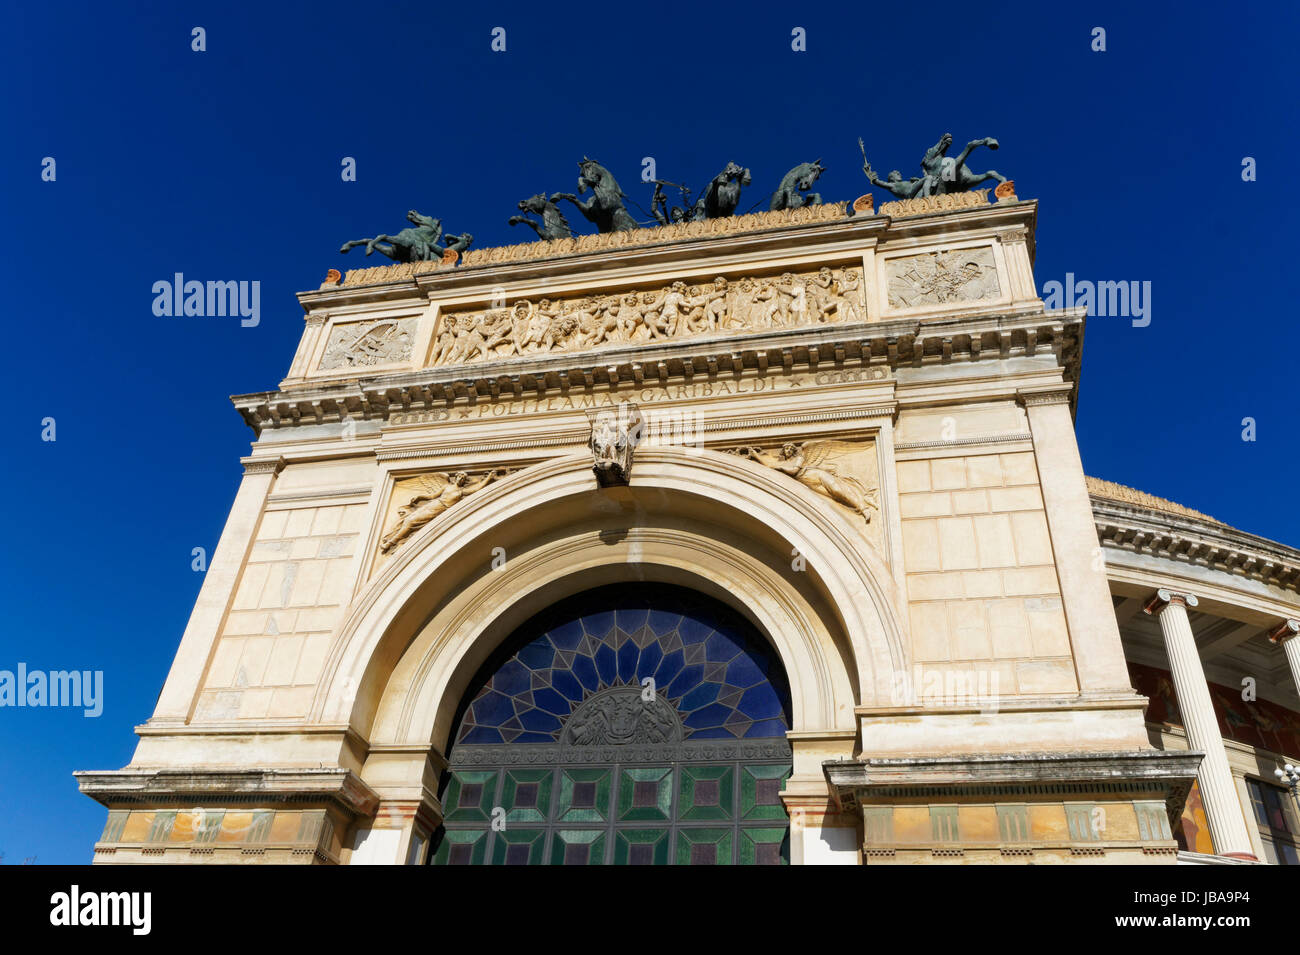 Politeama opera house, Palermo Italy Stock Photo: 144671356 - Alamy